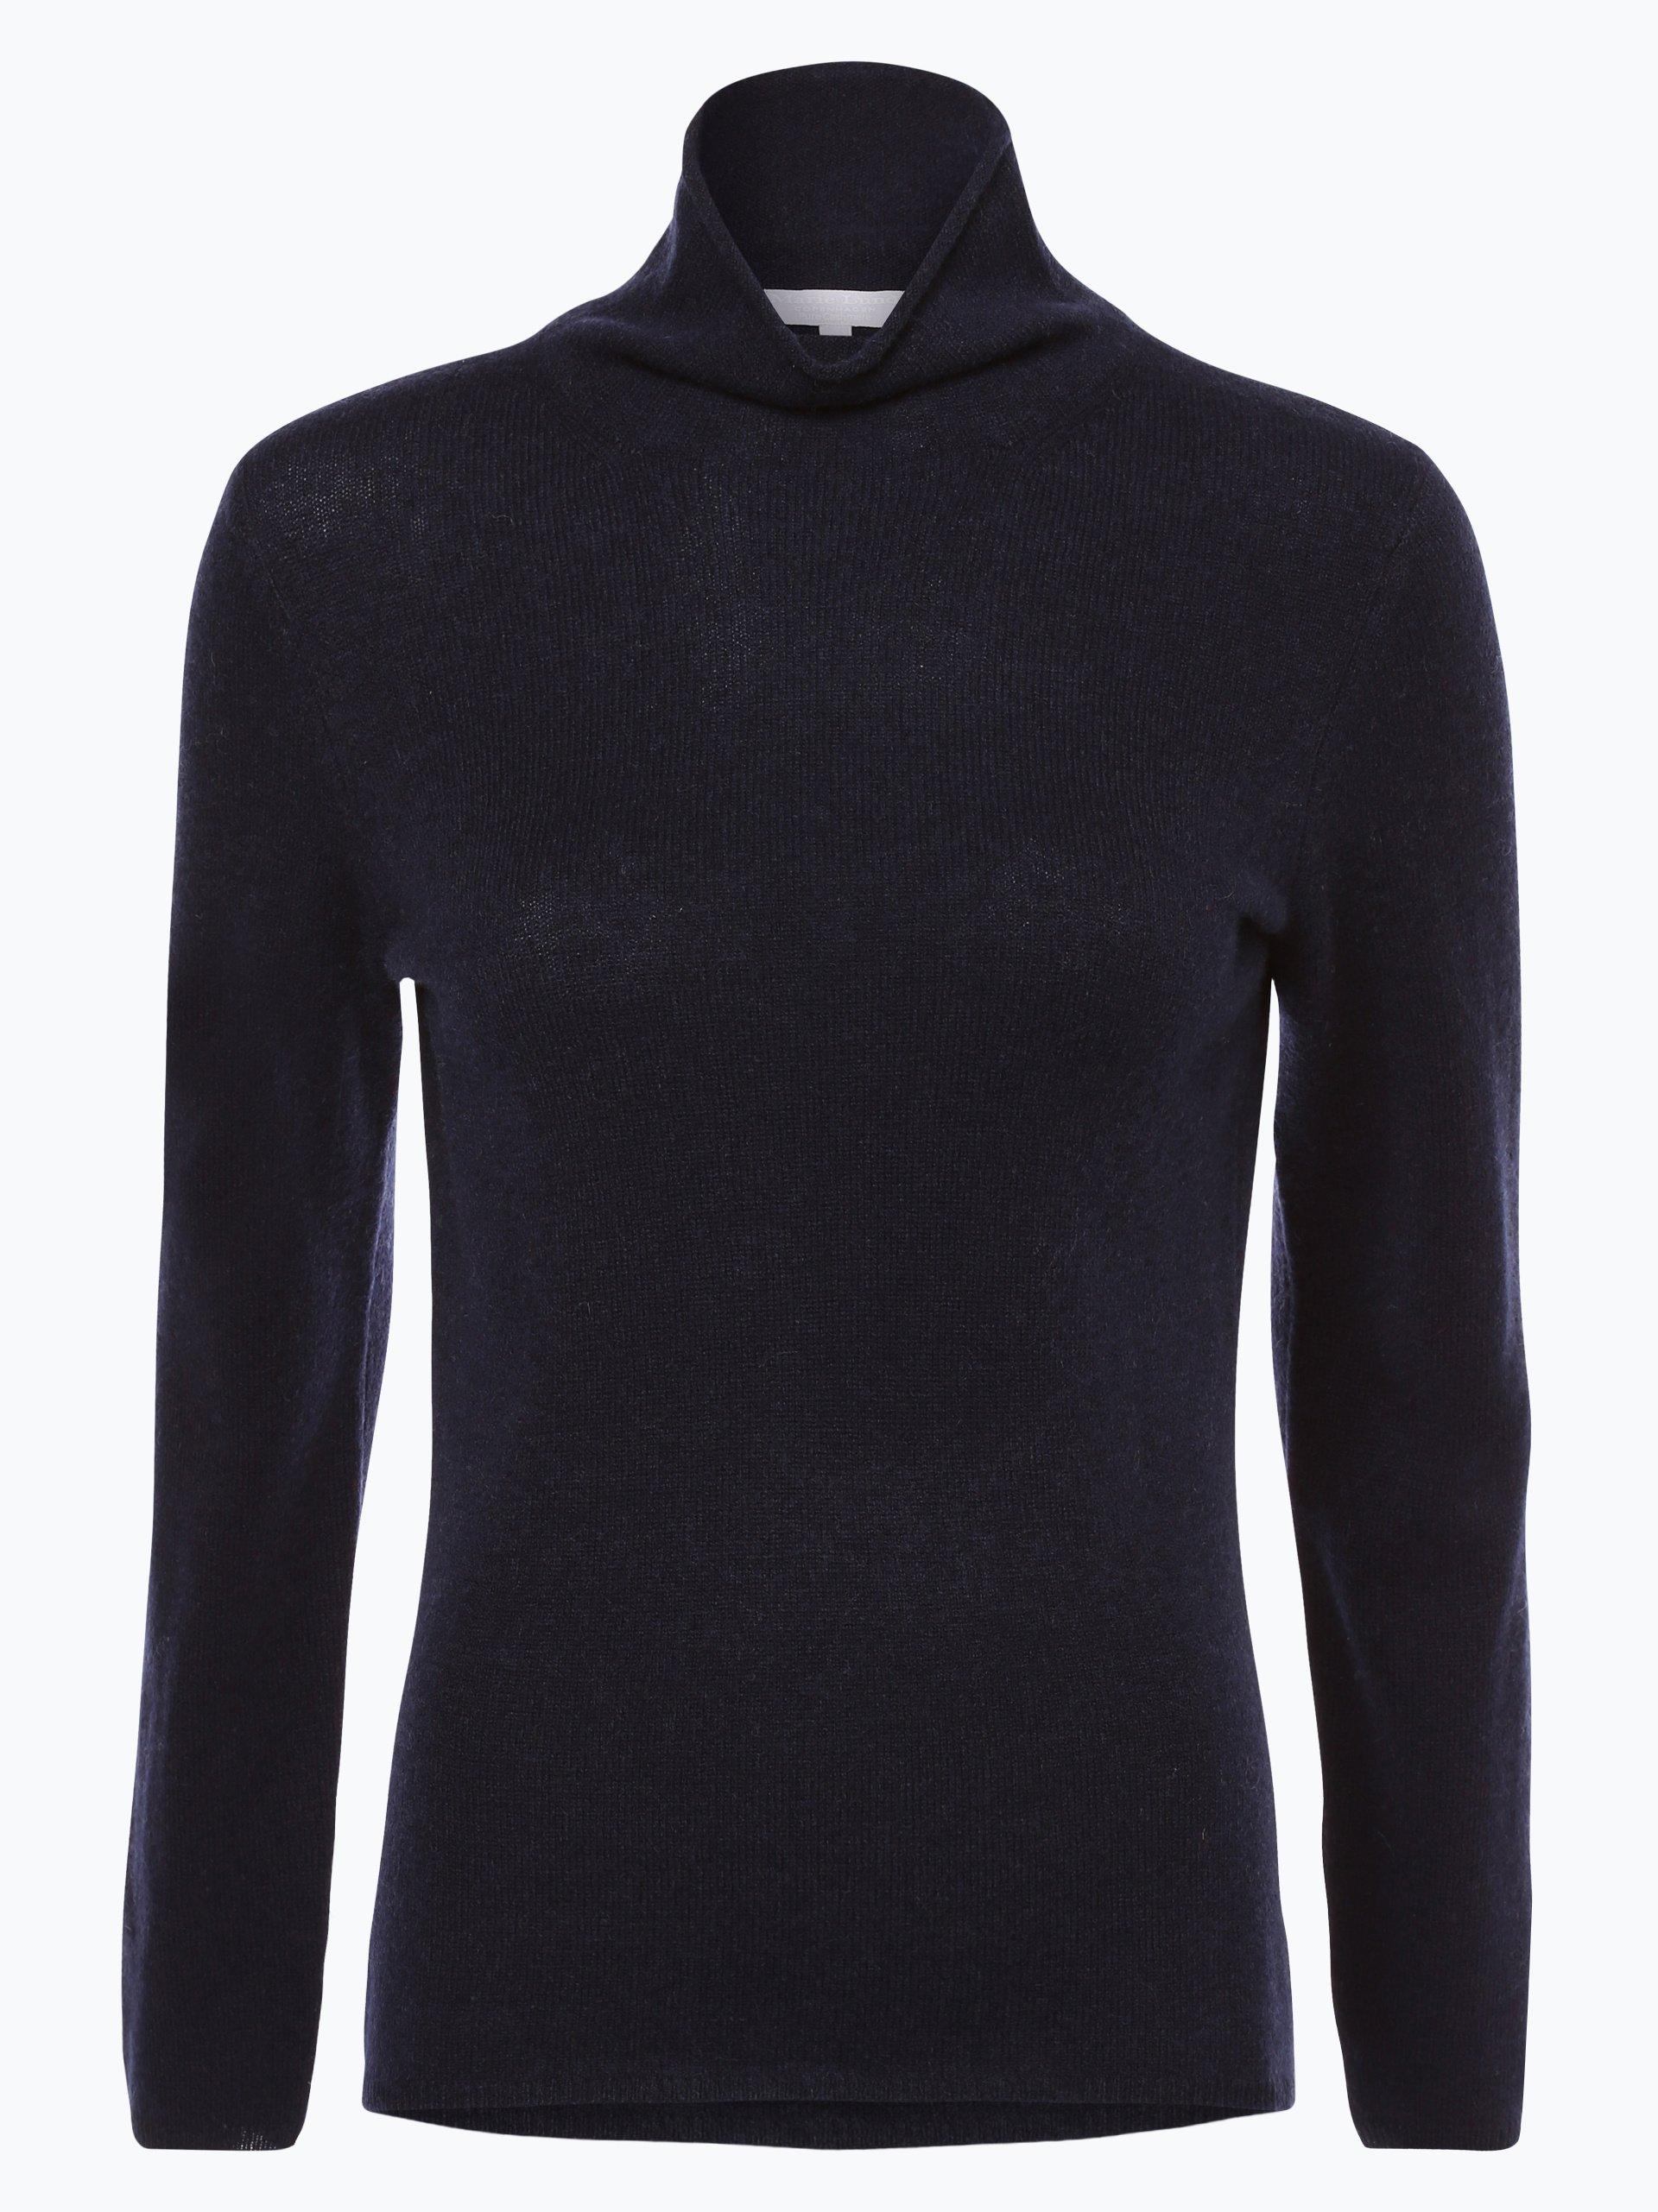 marie lund damen pure cashmere pullover marine uni online. Black Bedroom Furniture Sets. Home Design Ideas